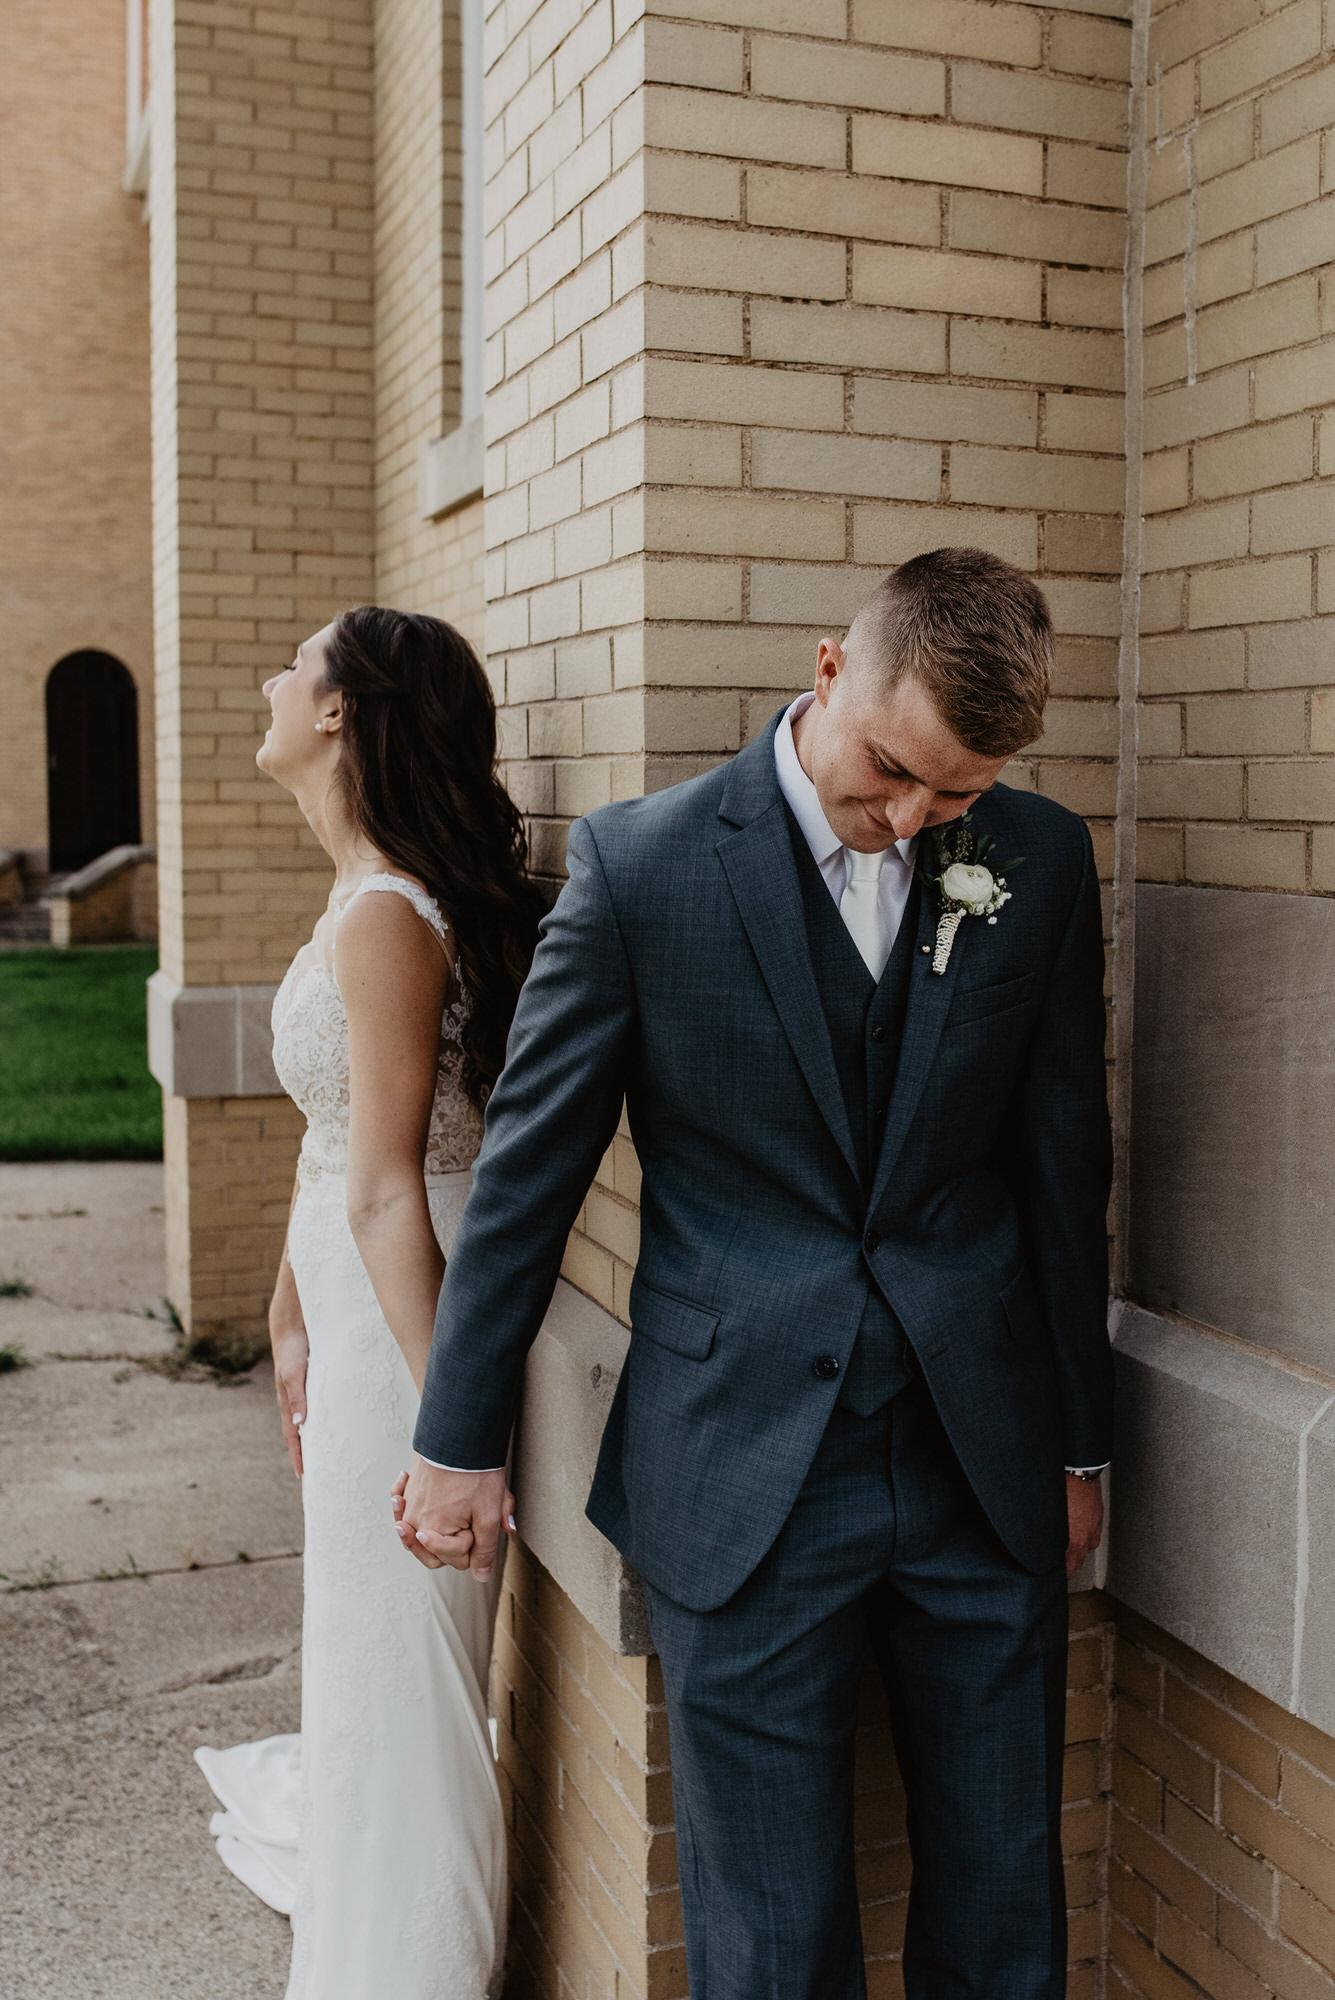 Kaylie Sirek Photography – Nebraska Wedding and Engagement Photographer – 033.jpg